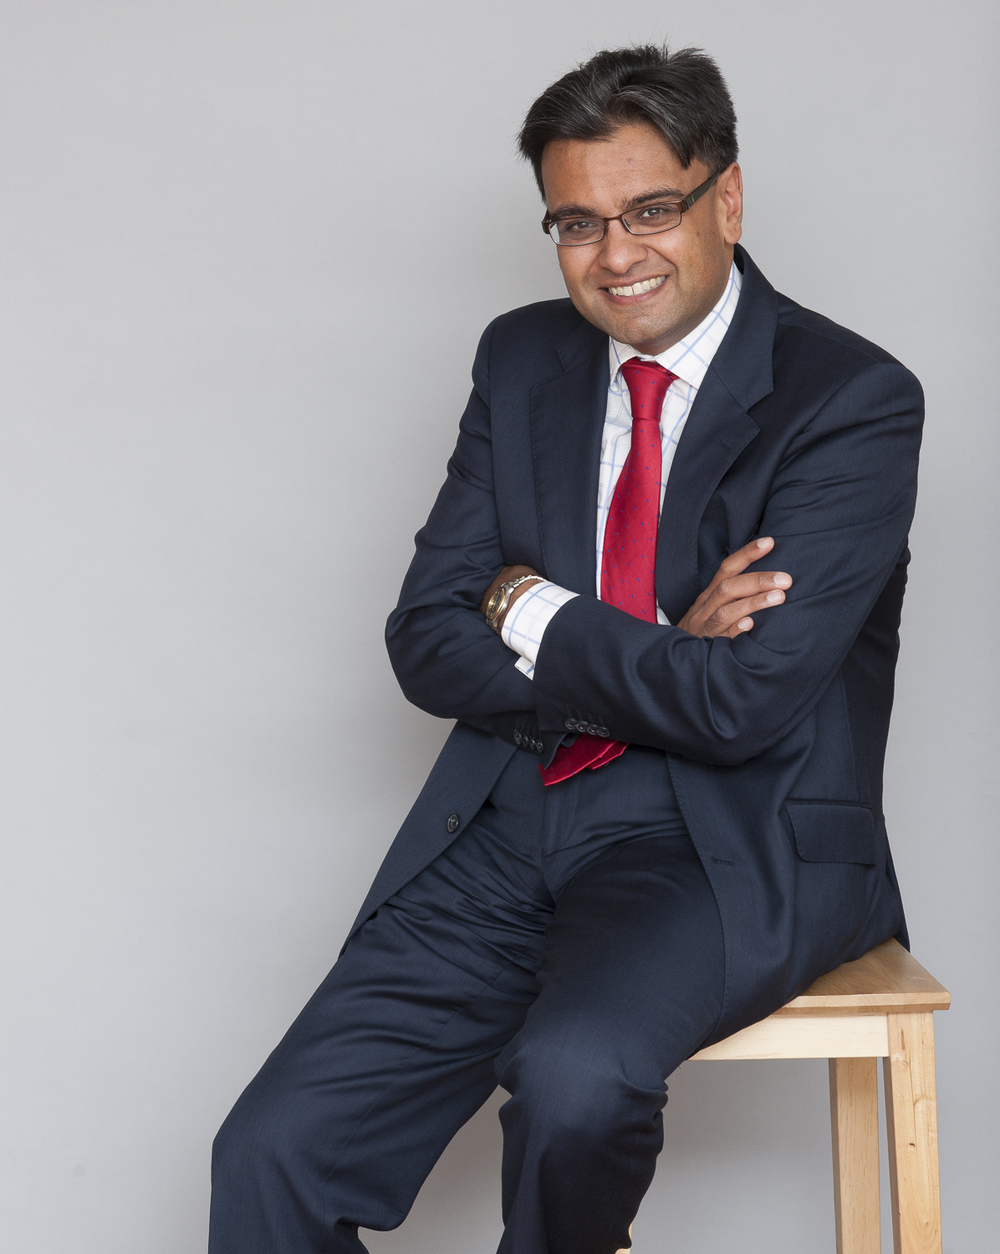 Manoj Styche-Patel-804.jpg